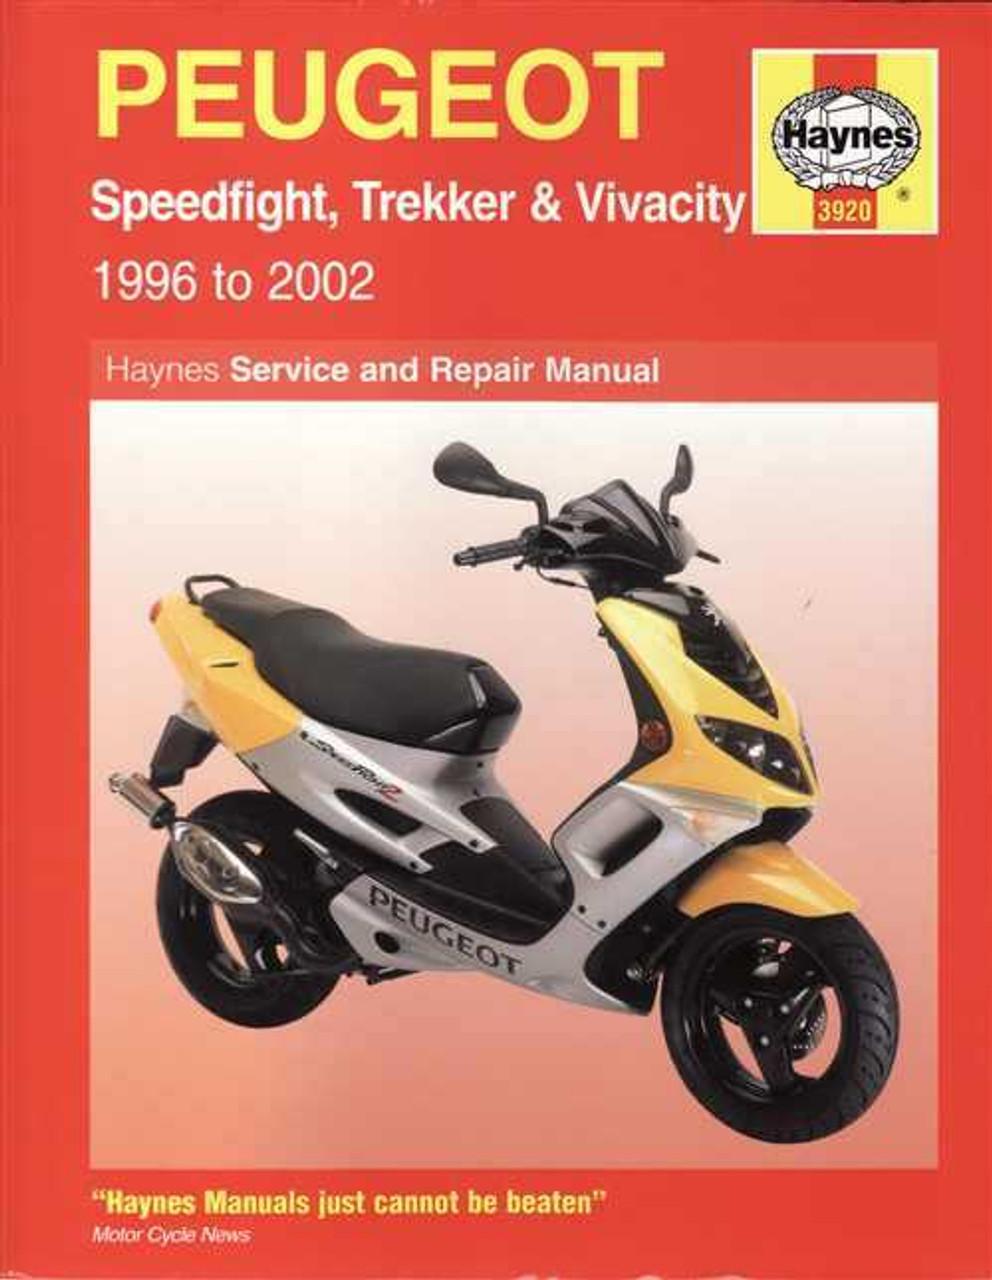 peugeot scooters speedfight trekker amp vivacity 1996 2002 workshop manual [ 992 x 1280 Pixel ]